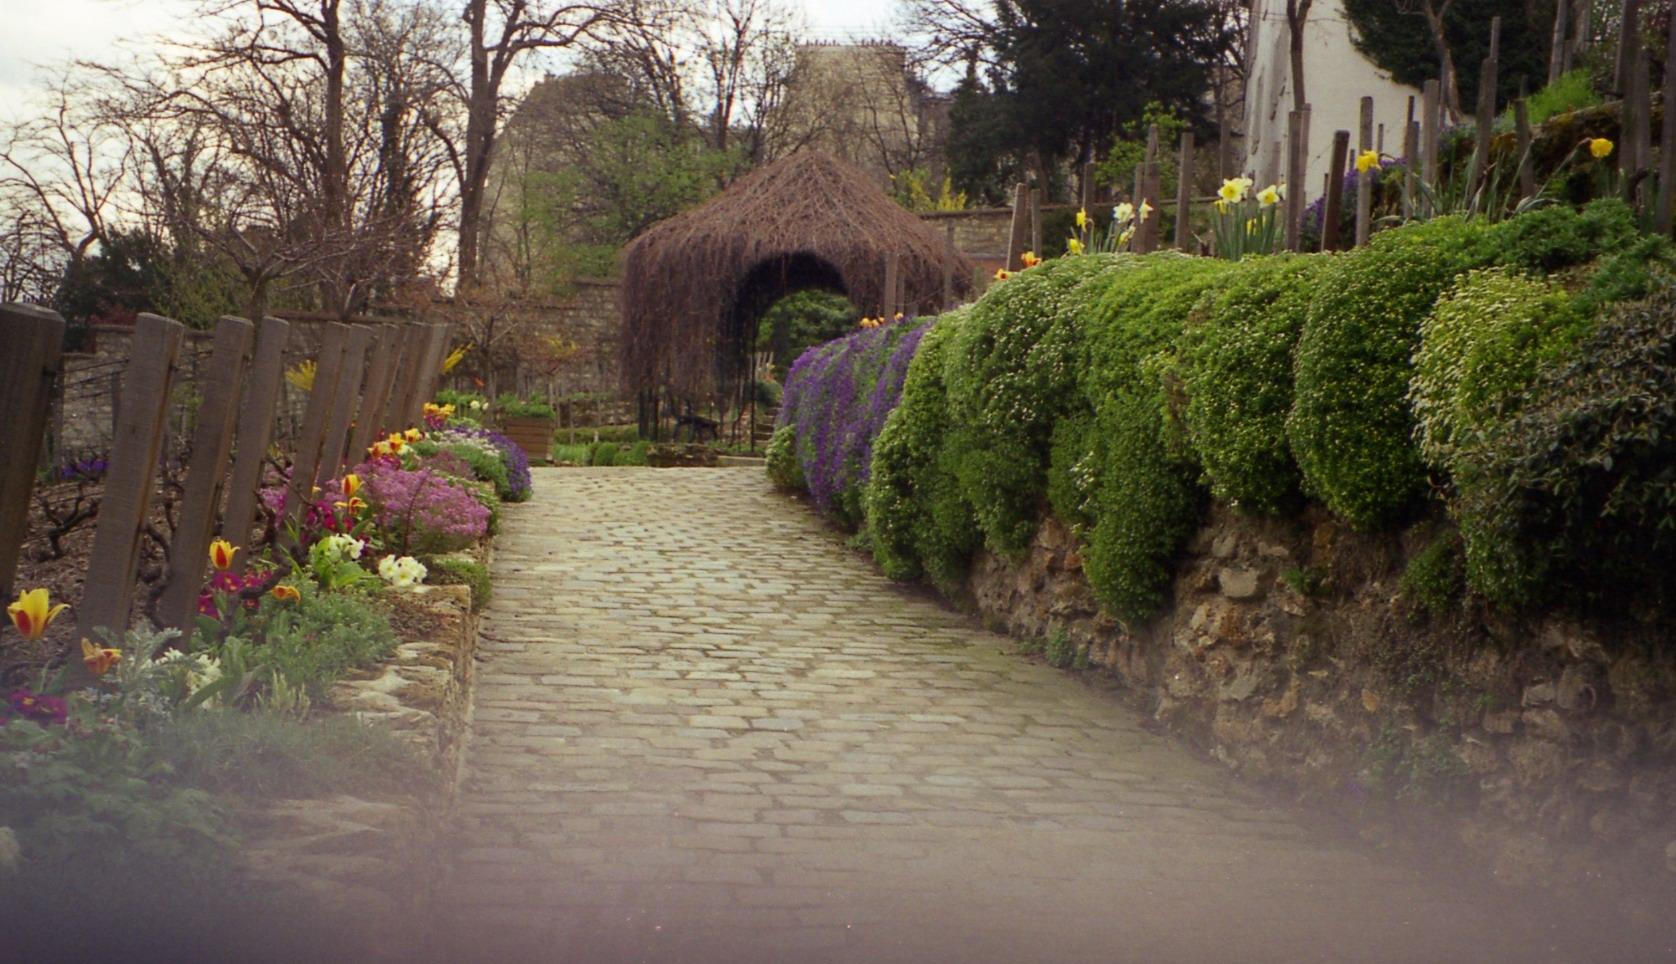 Garden near agile rabbit house in montmartre paris france